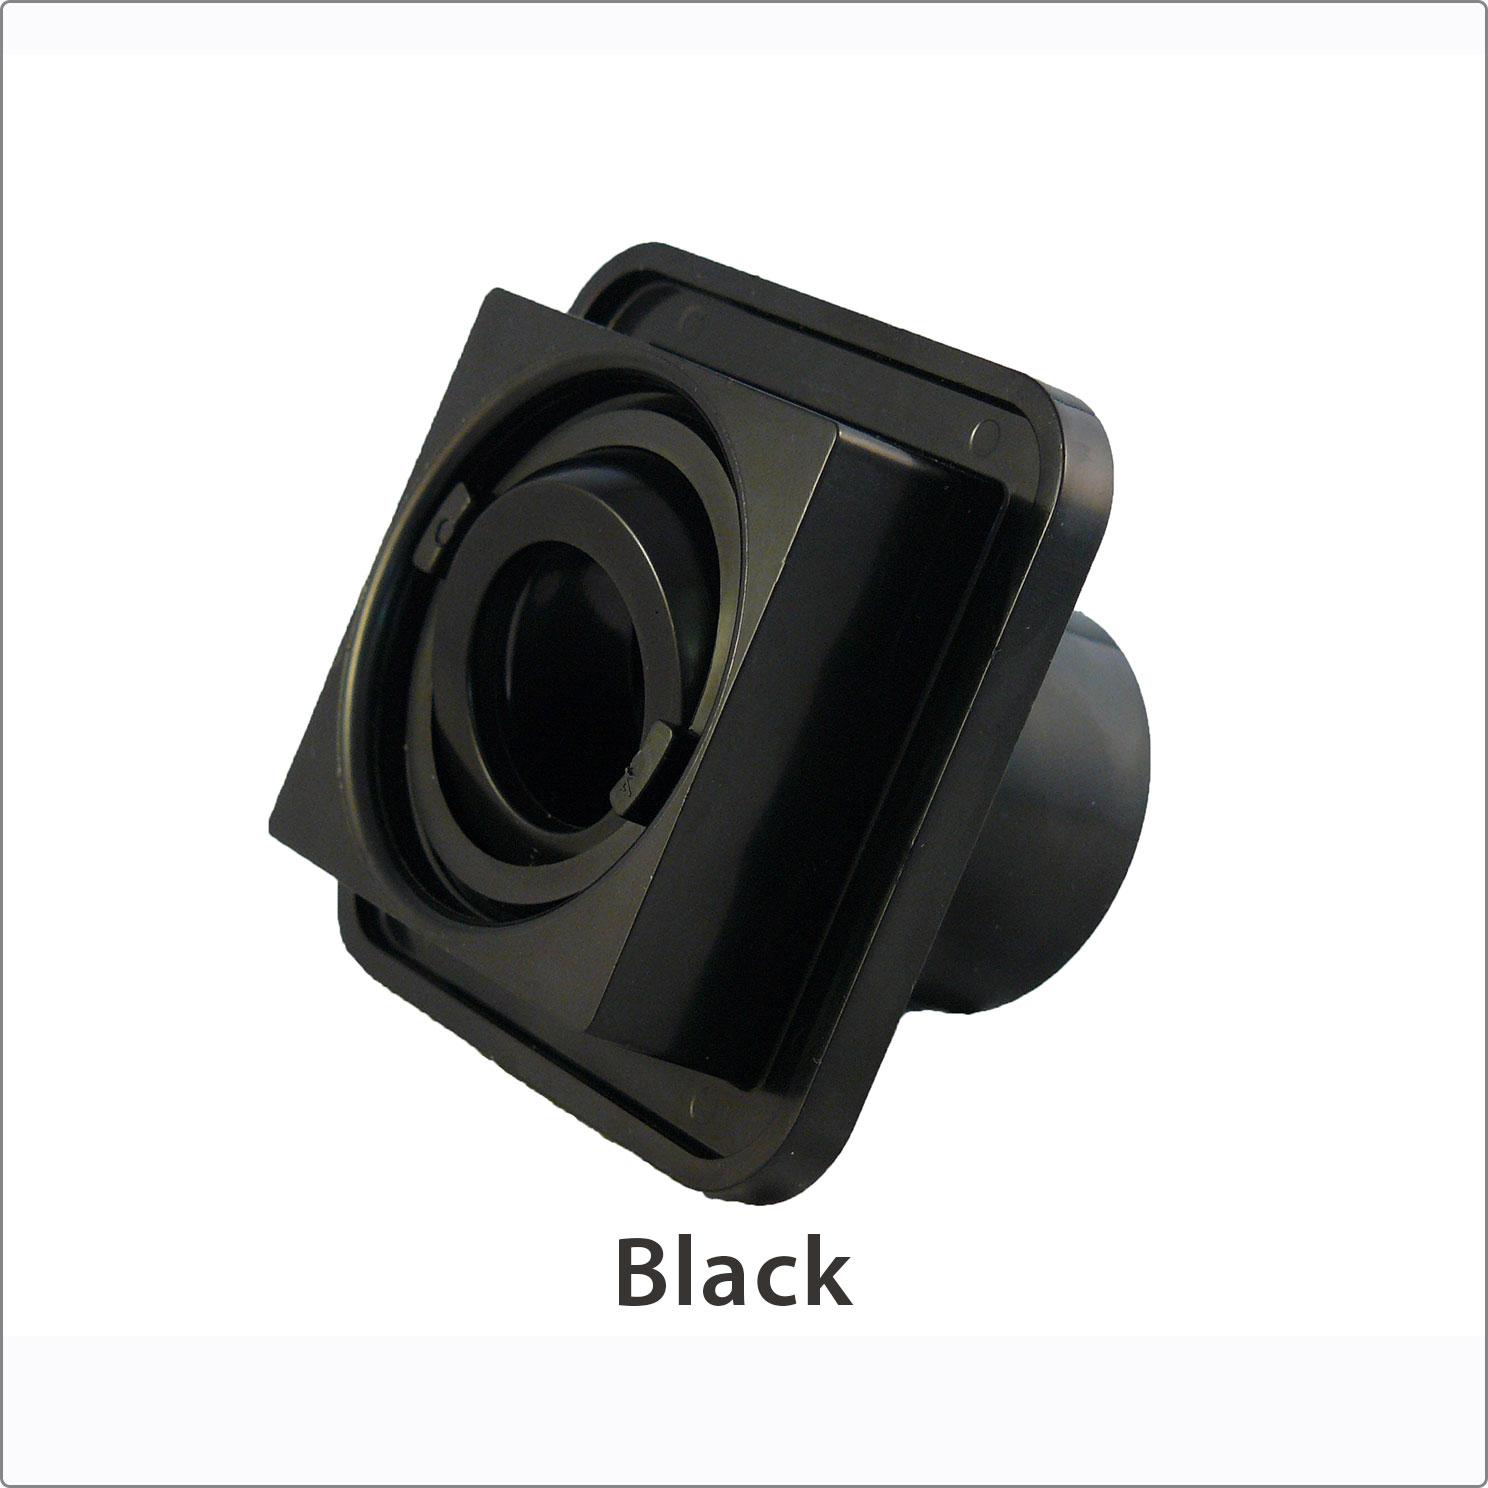 Square-Flush-Mount-Black.jpg